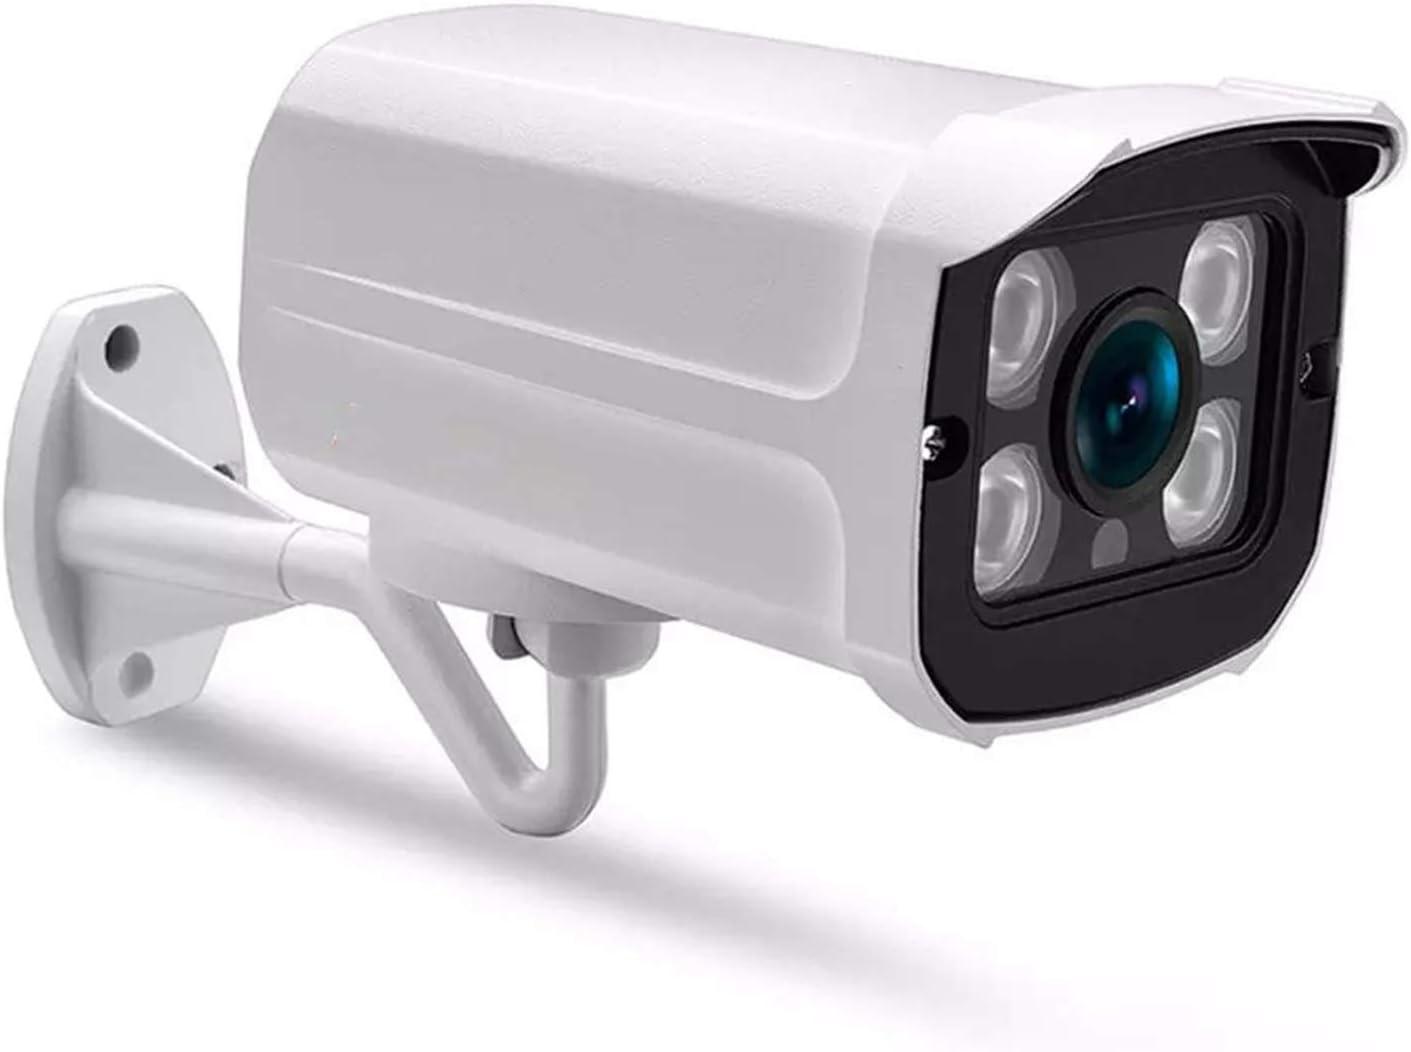 SVNA Gran Angular 2.8 mm 2MP 3MP 5MP Cámara IP Vigilancia Impermeable P2P RTSP Cámara CCTV Tipo Bala Alerta de Correo electrónico al Aire Libre (Color : 2MP)